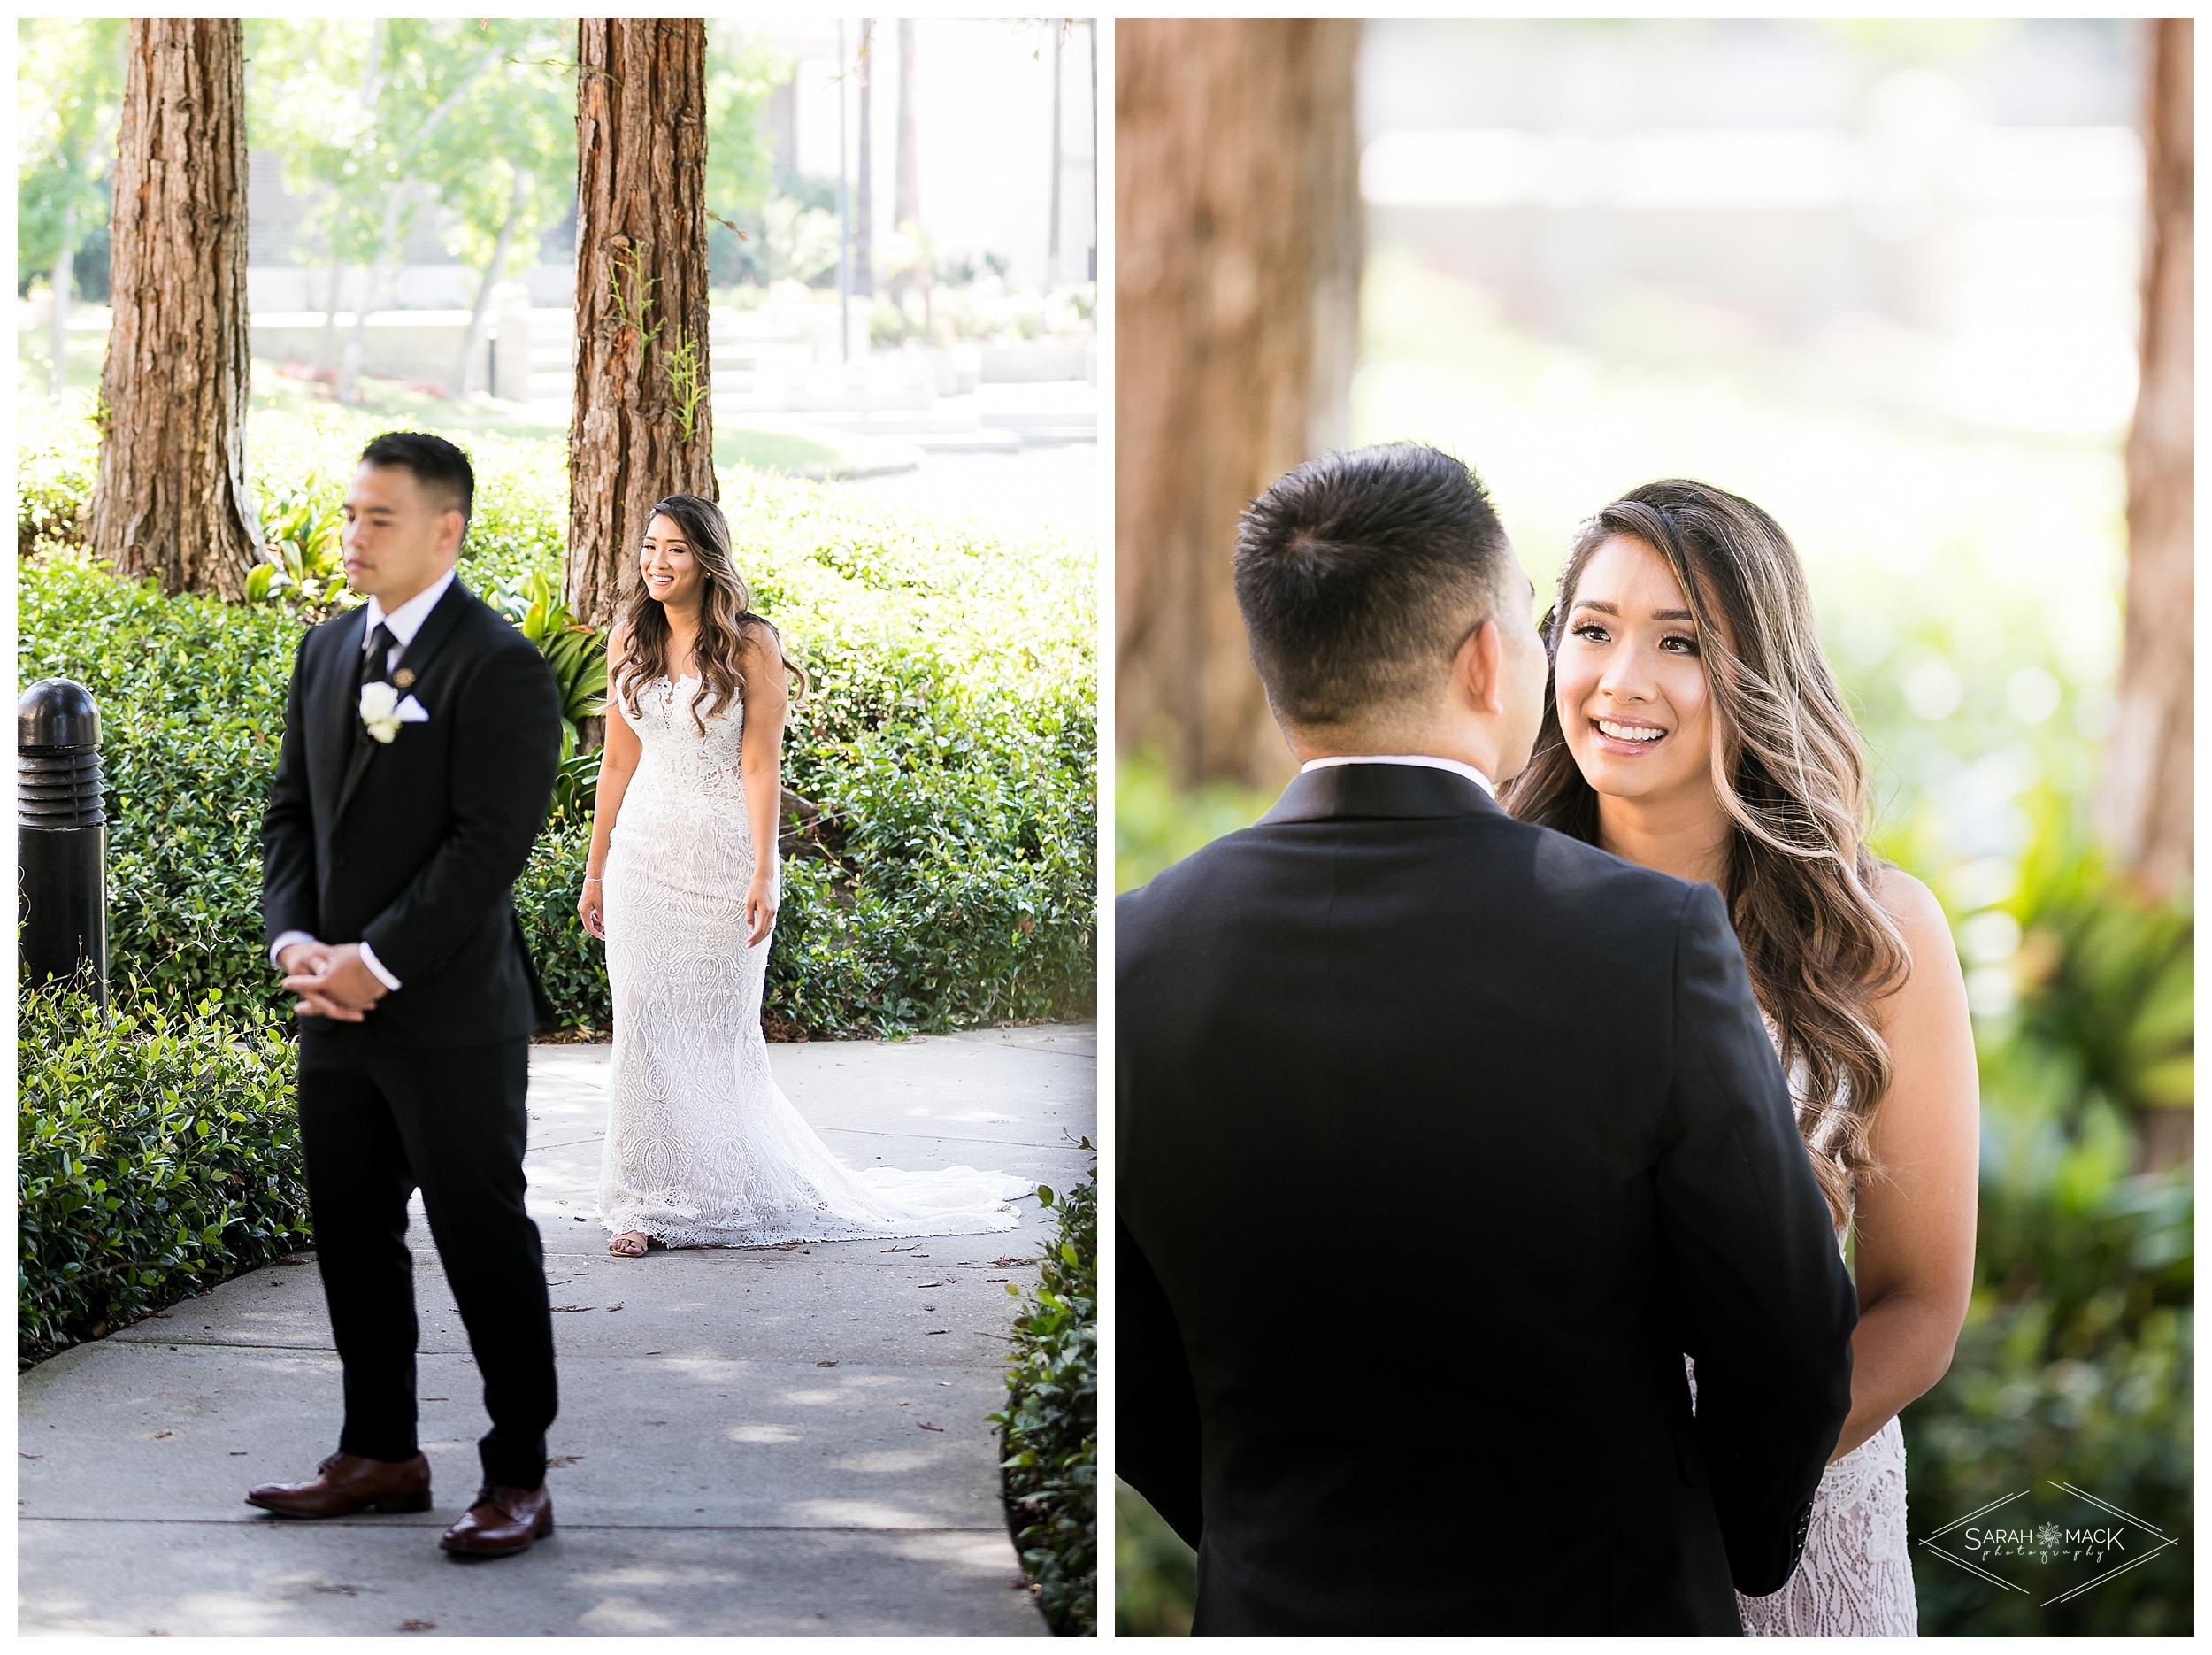 LE-Avenue-of-the-Arts-Costa-Mesa-Wedding-Photography-0077.jpg